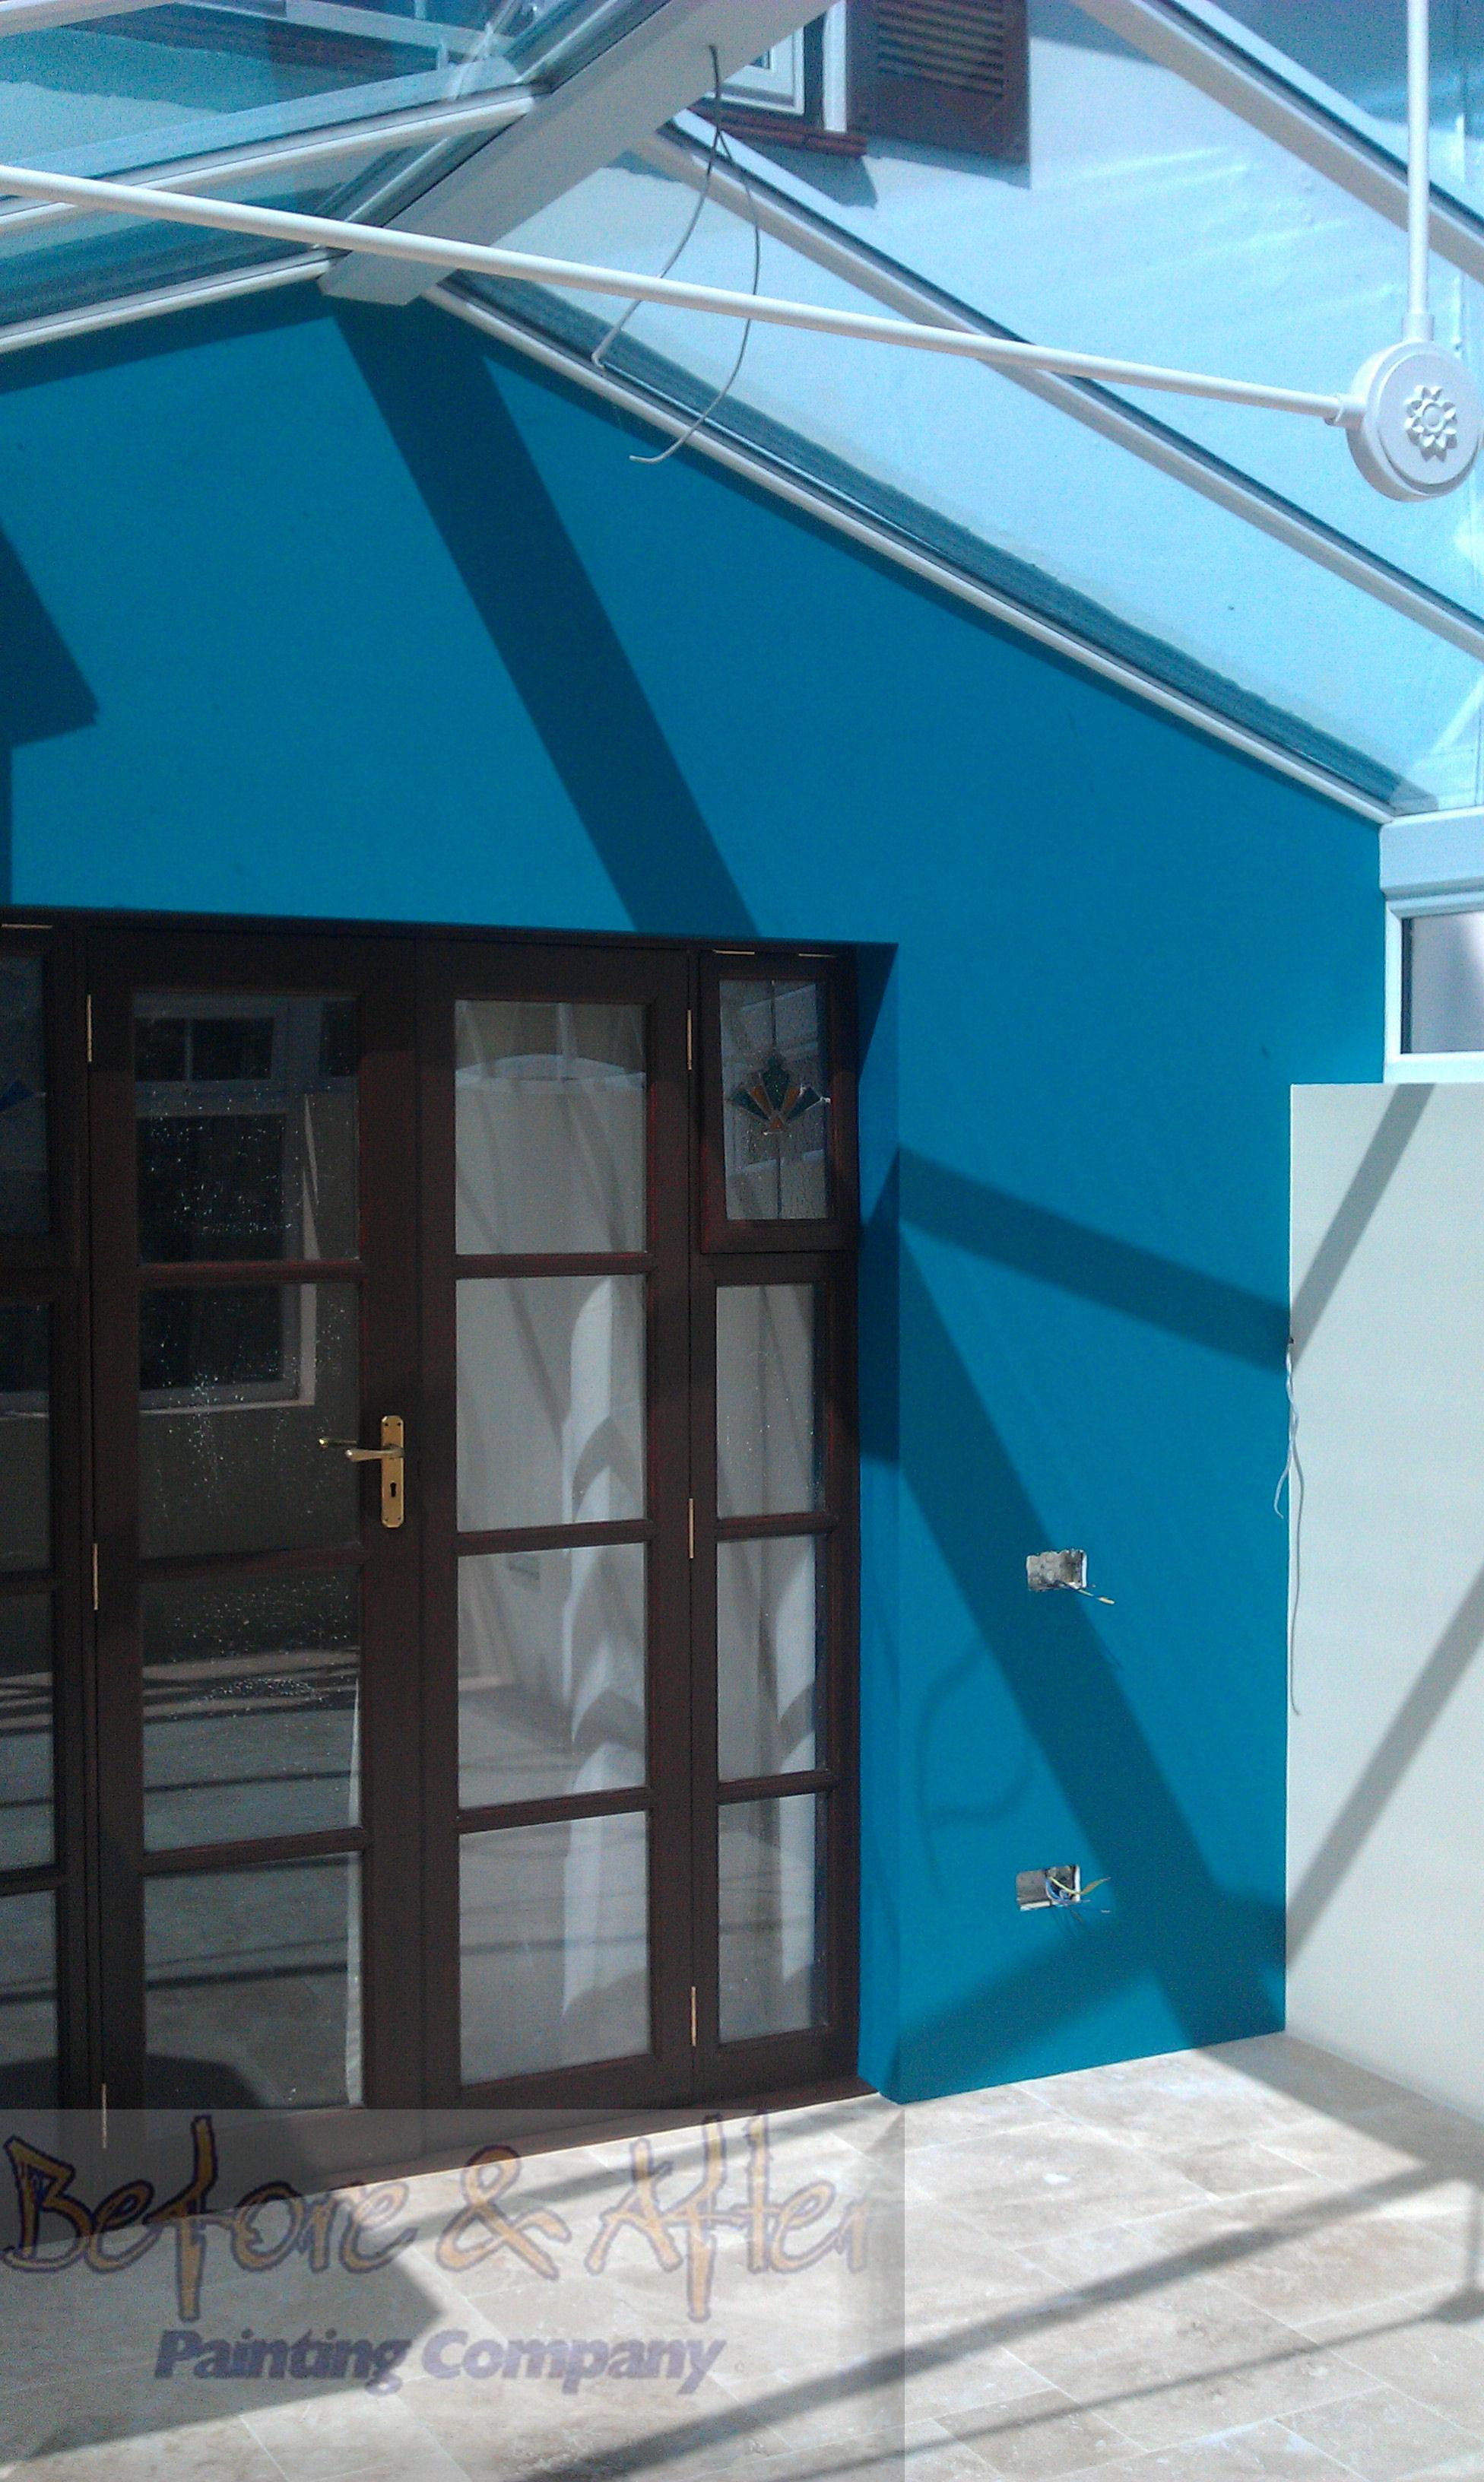 Glazed french doors and frame finished Sikkens Cetol Filter 7 - Walnut